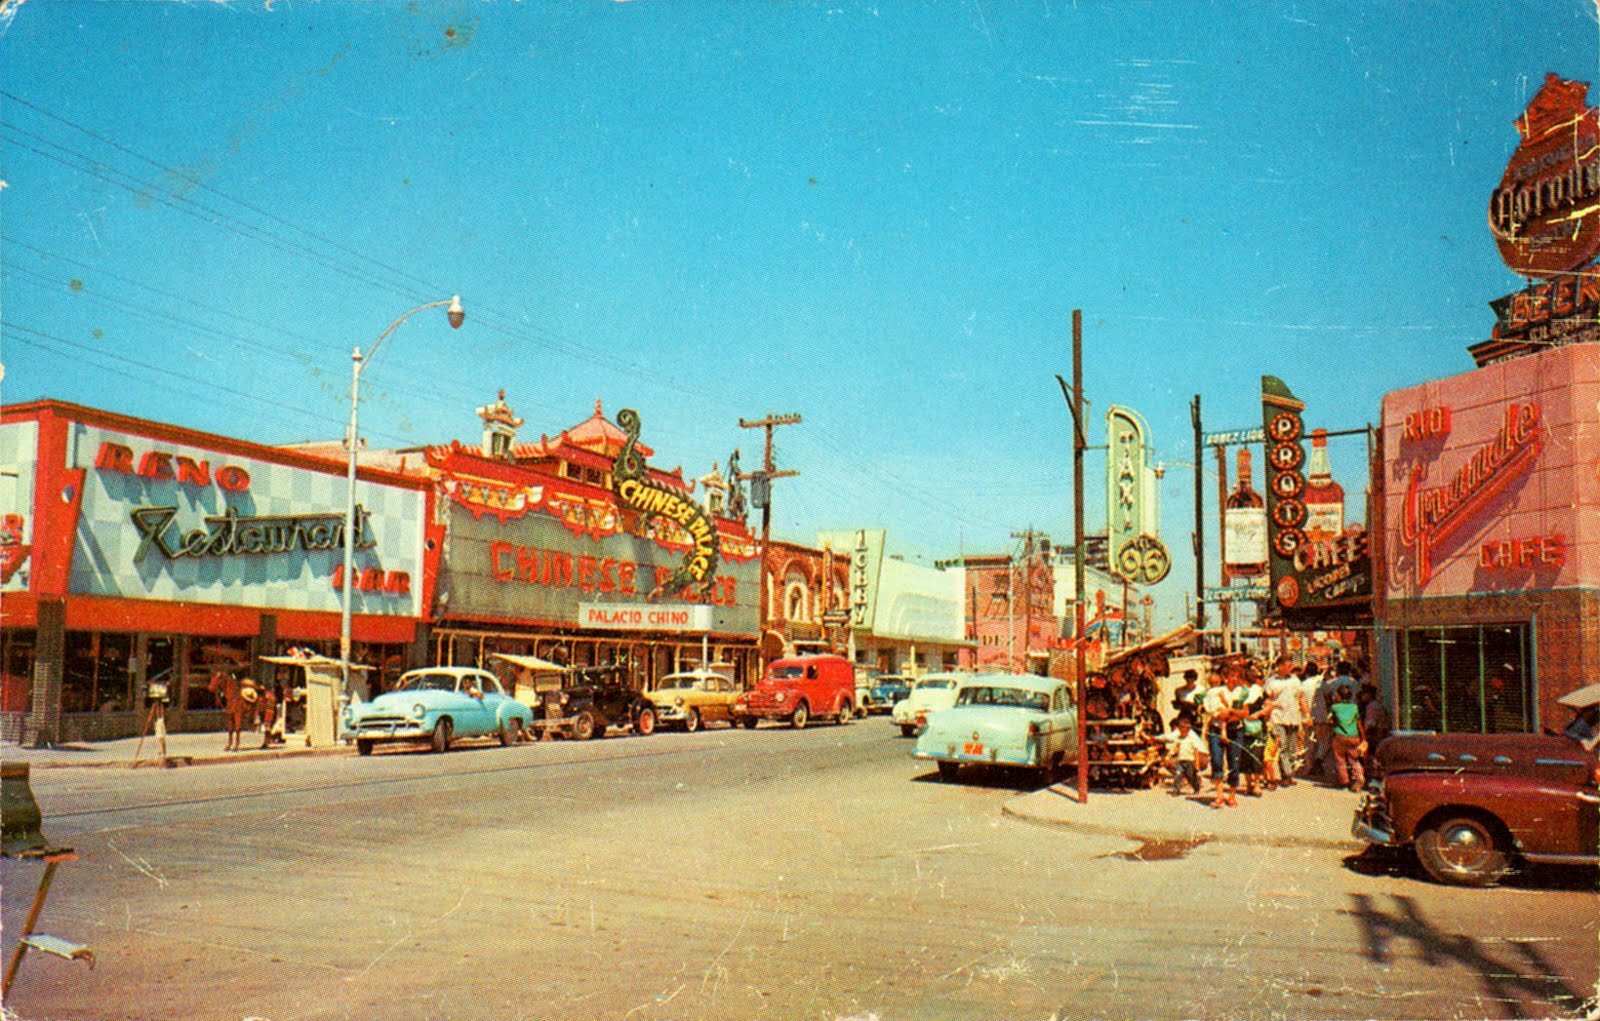 Juárez Avenue, Juárez, in the 1950s